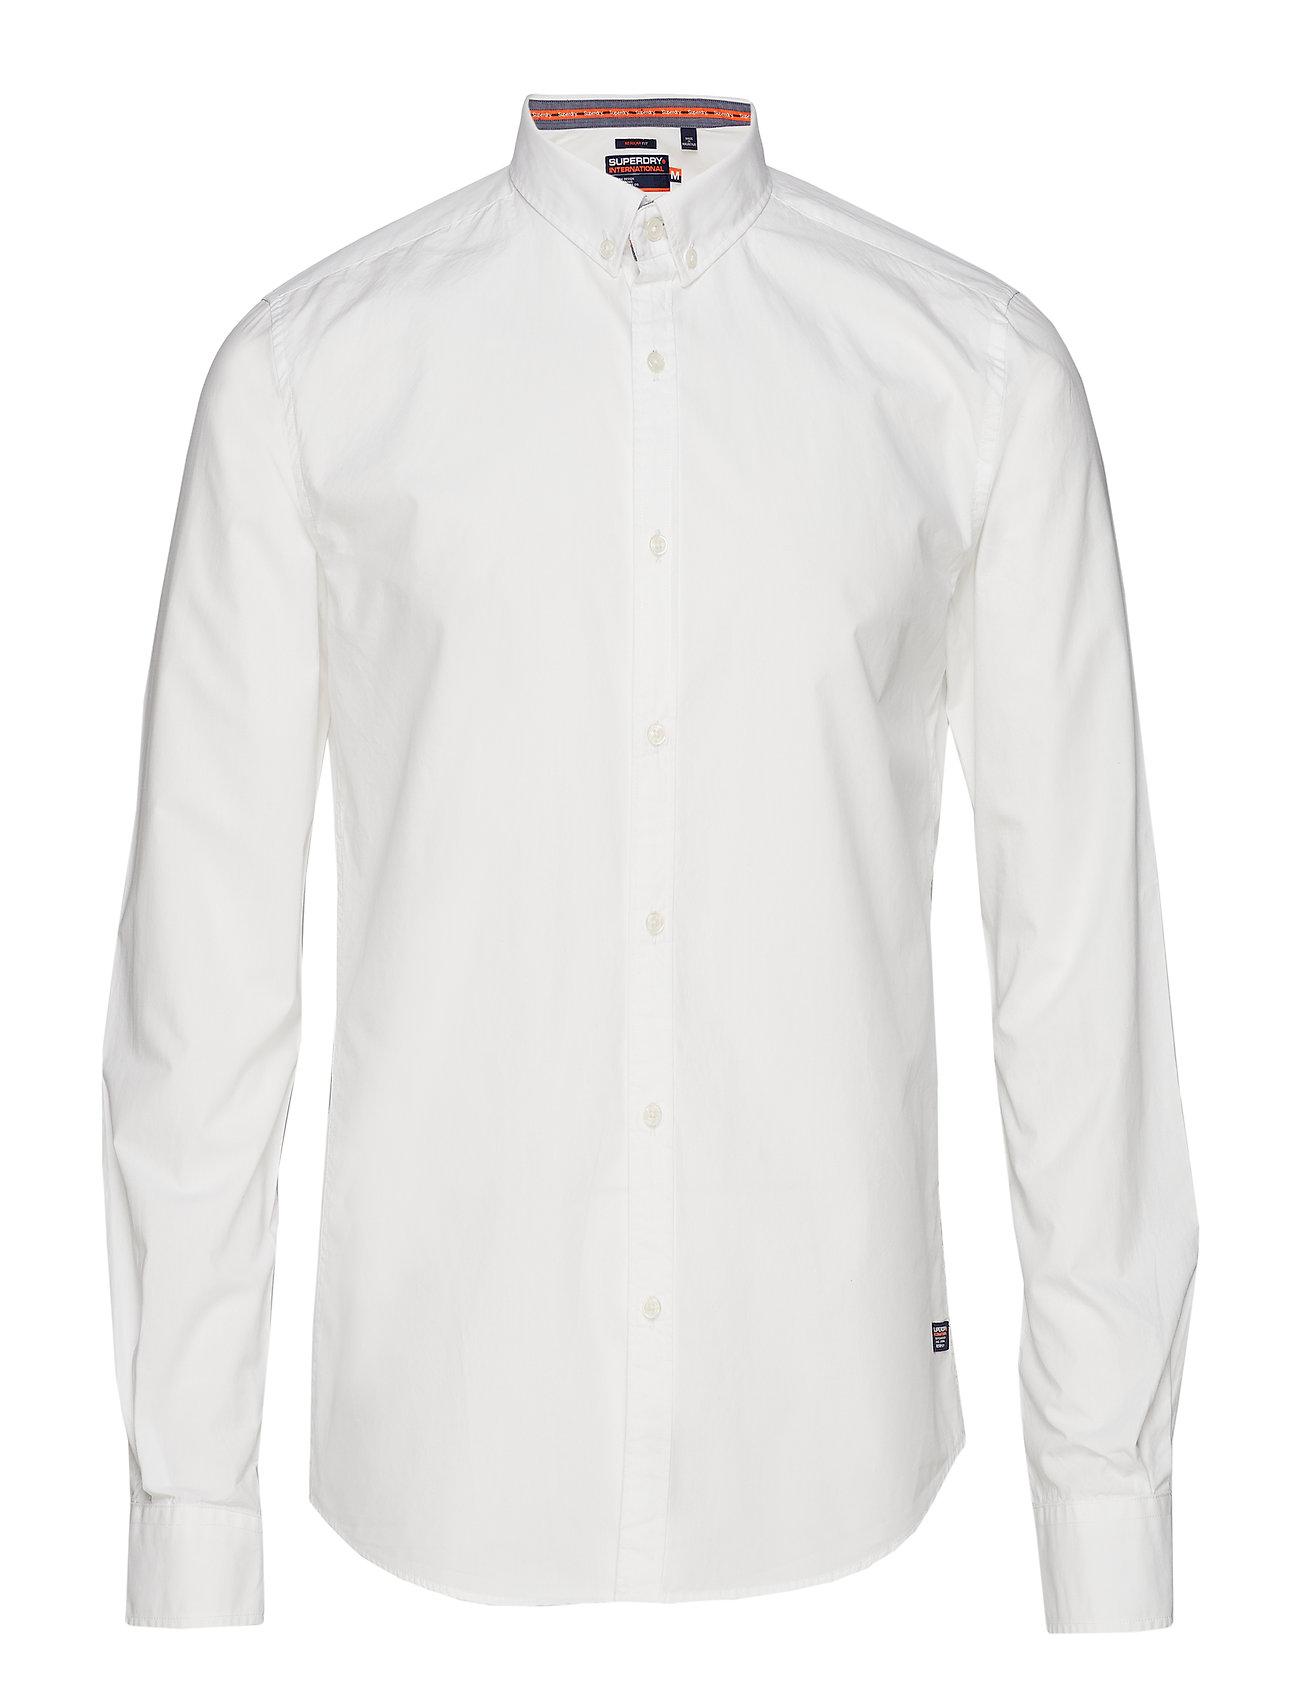 Superdry International Poplin Long Sleeve Shirt